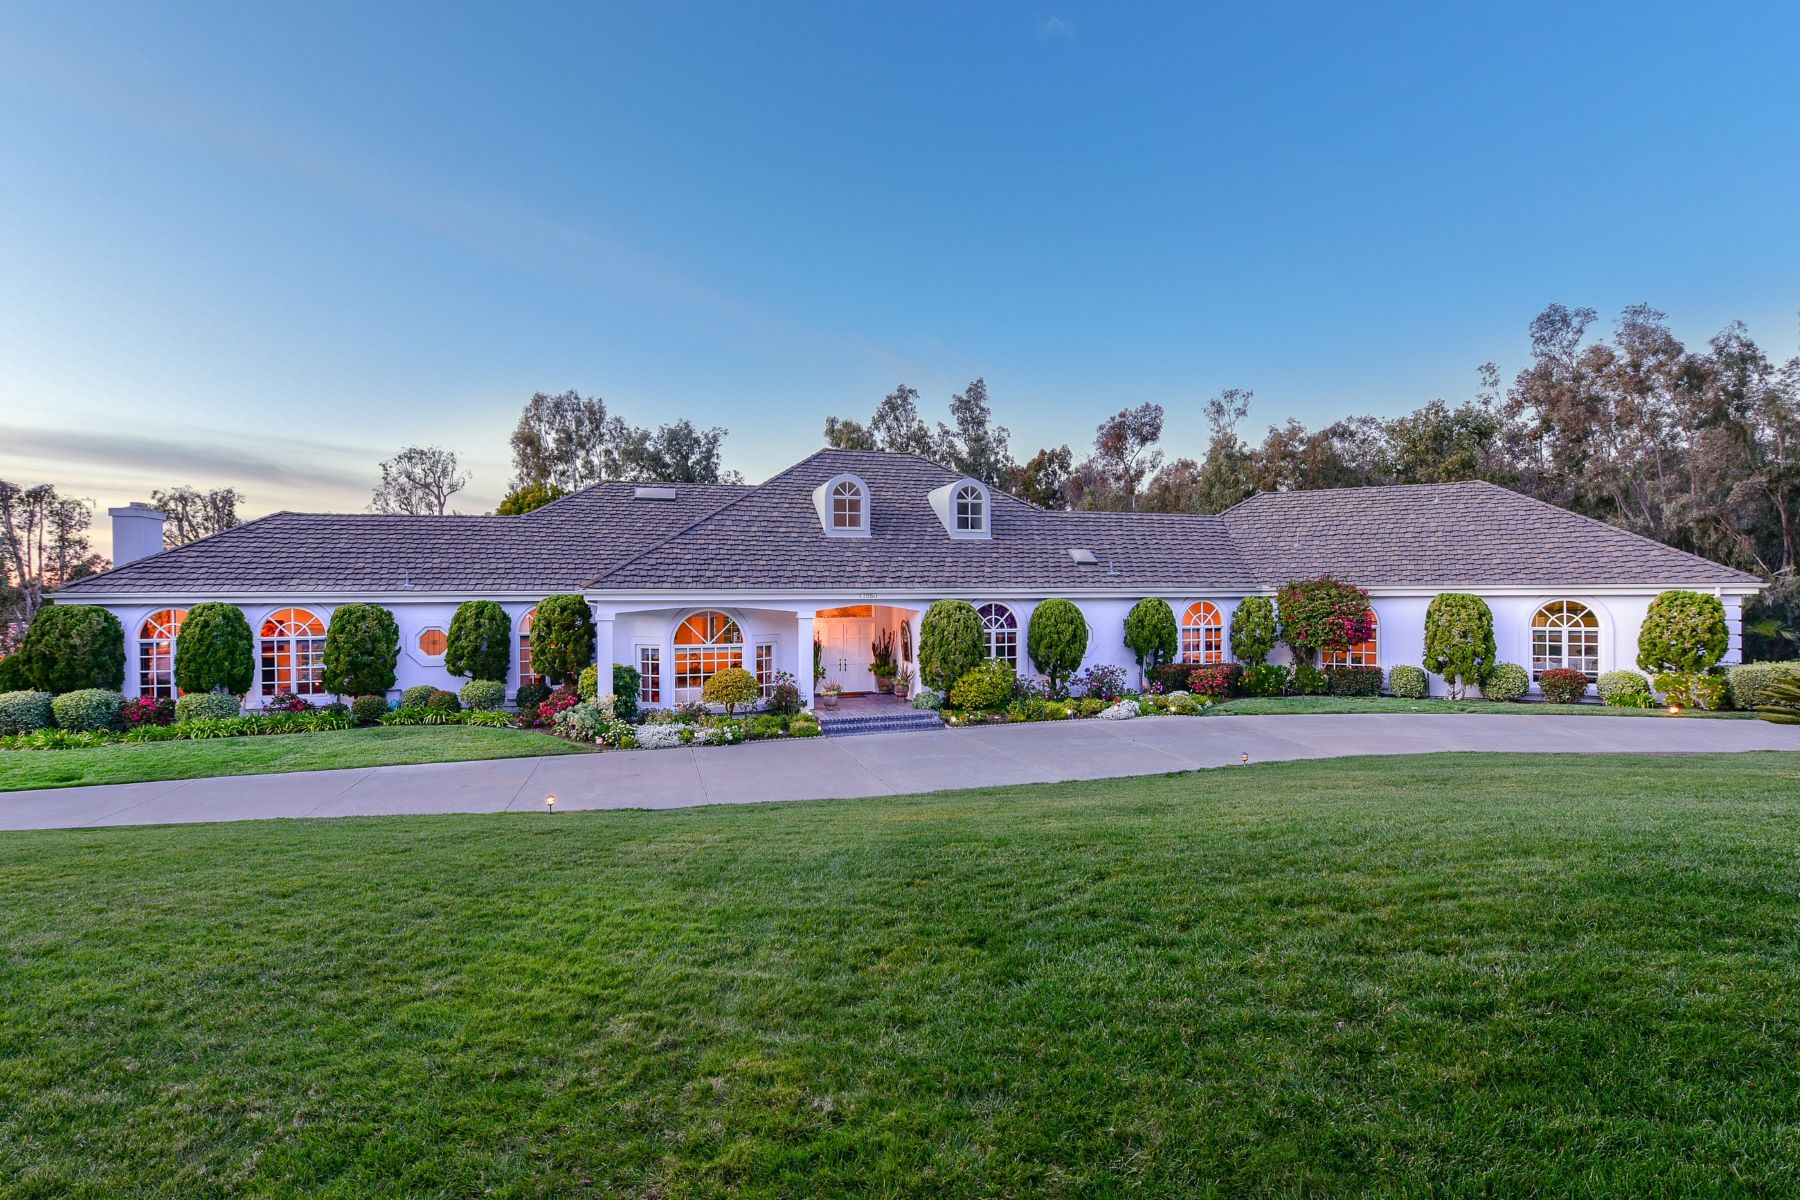 Single Family Homes for Sale at 17950 Circa Oriente Rancho Santa Fe, California 92067 United States